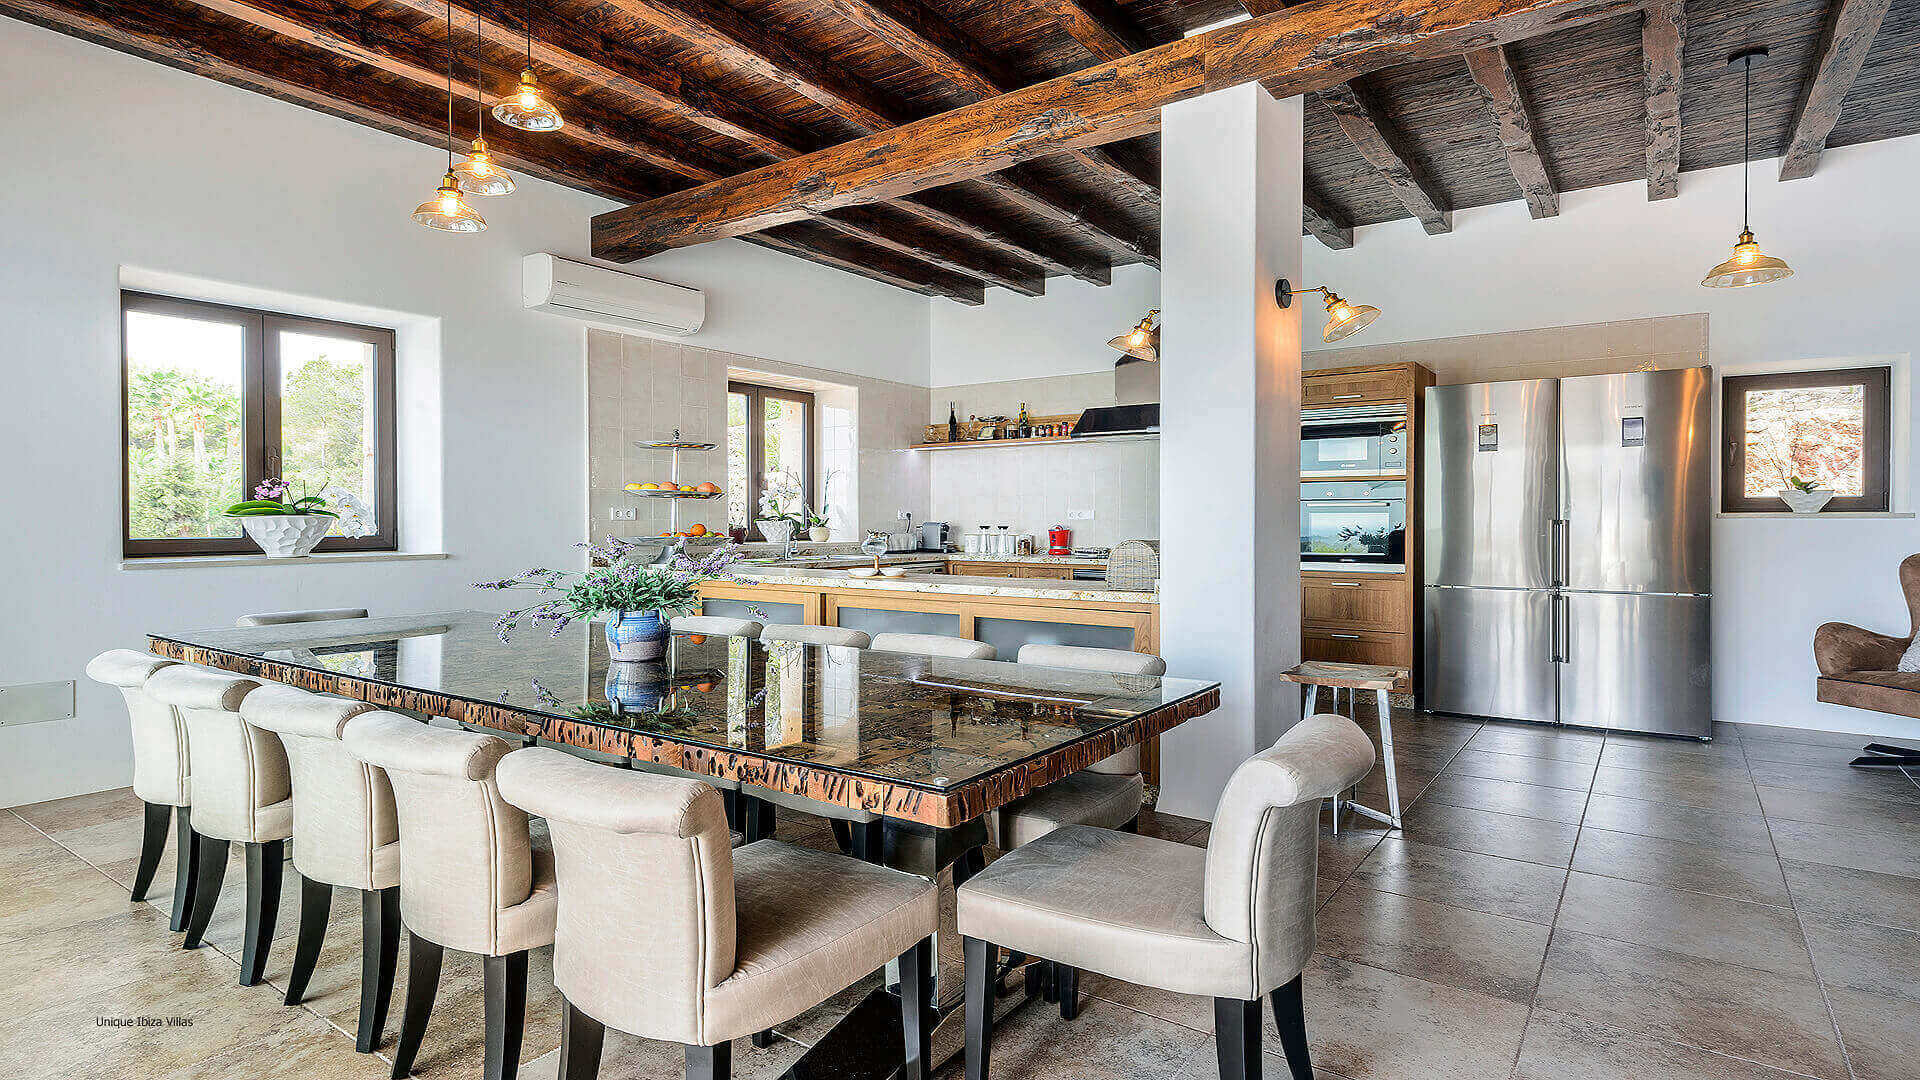 Casa Prats Ibiza 24 Santa Eulalia